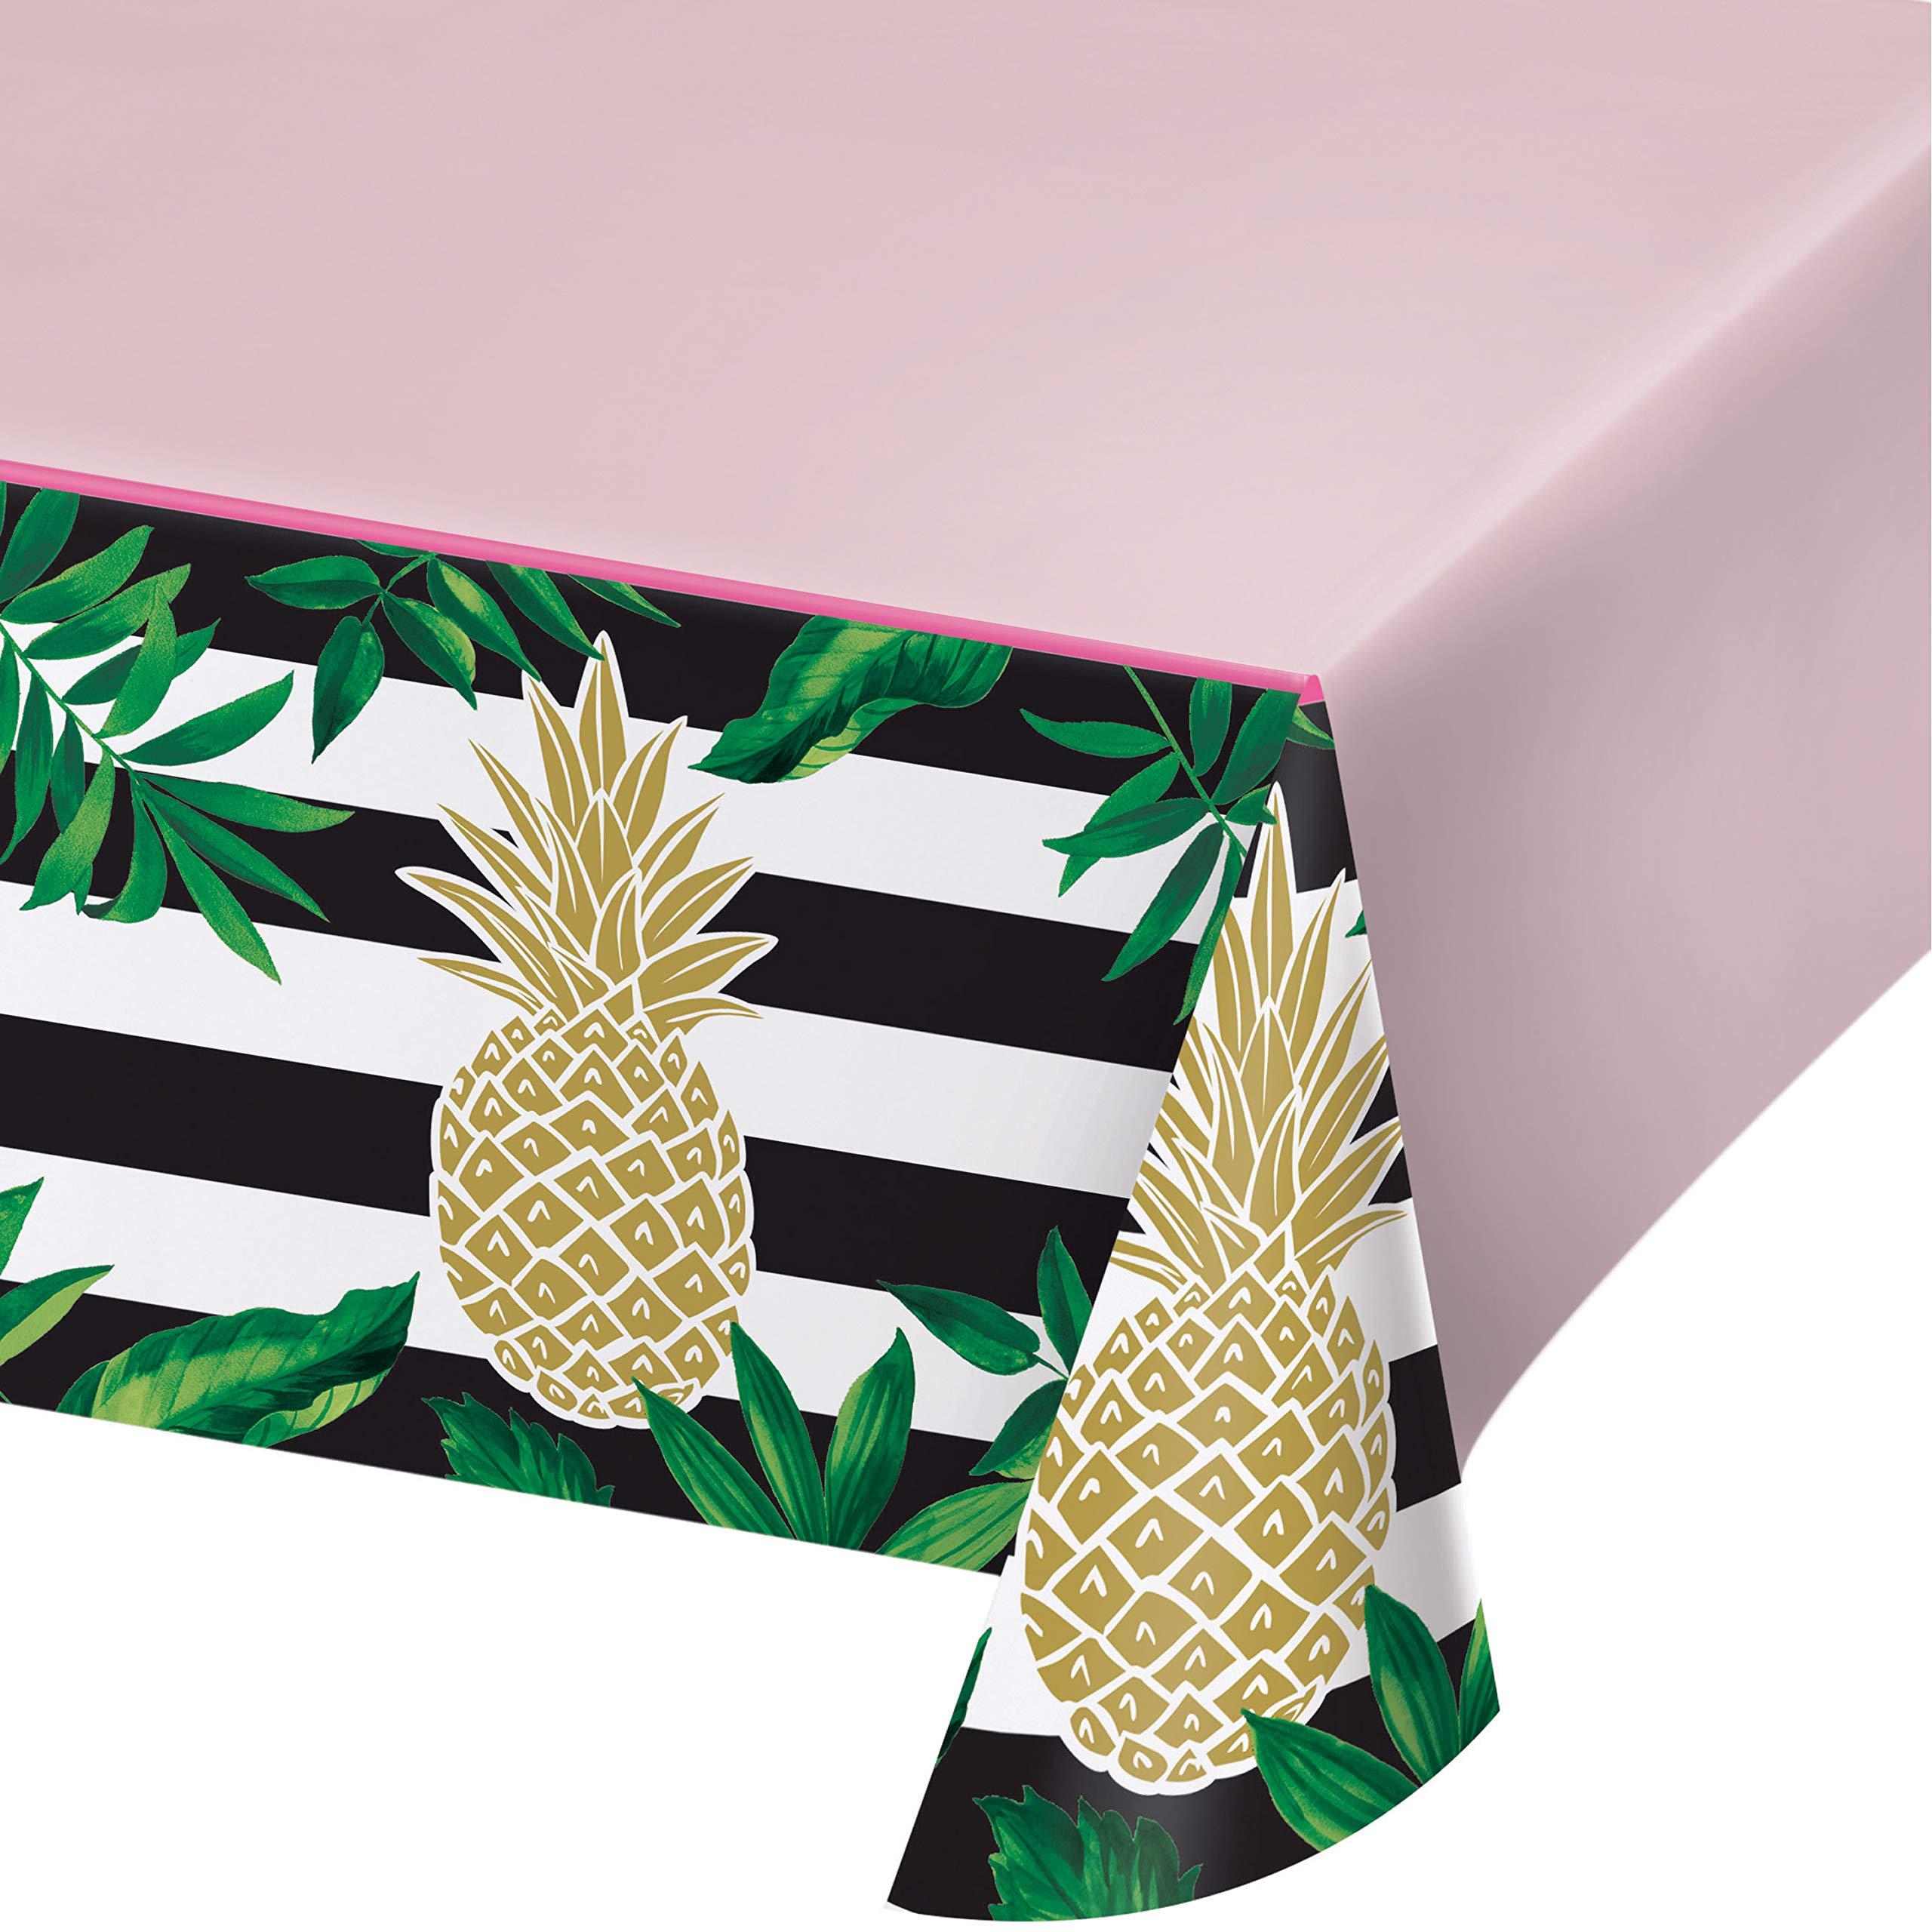 Golden Pineapple Plastic Tablecloths, 3 ct